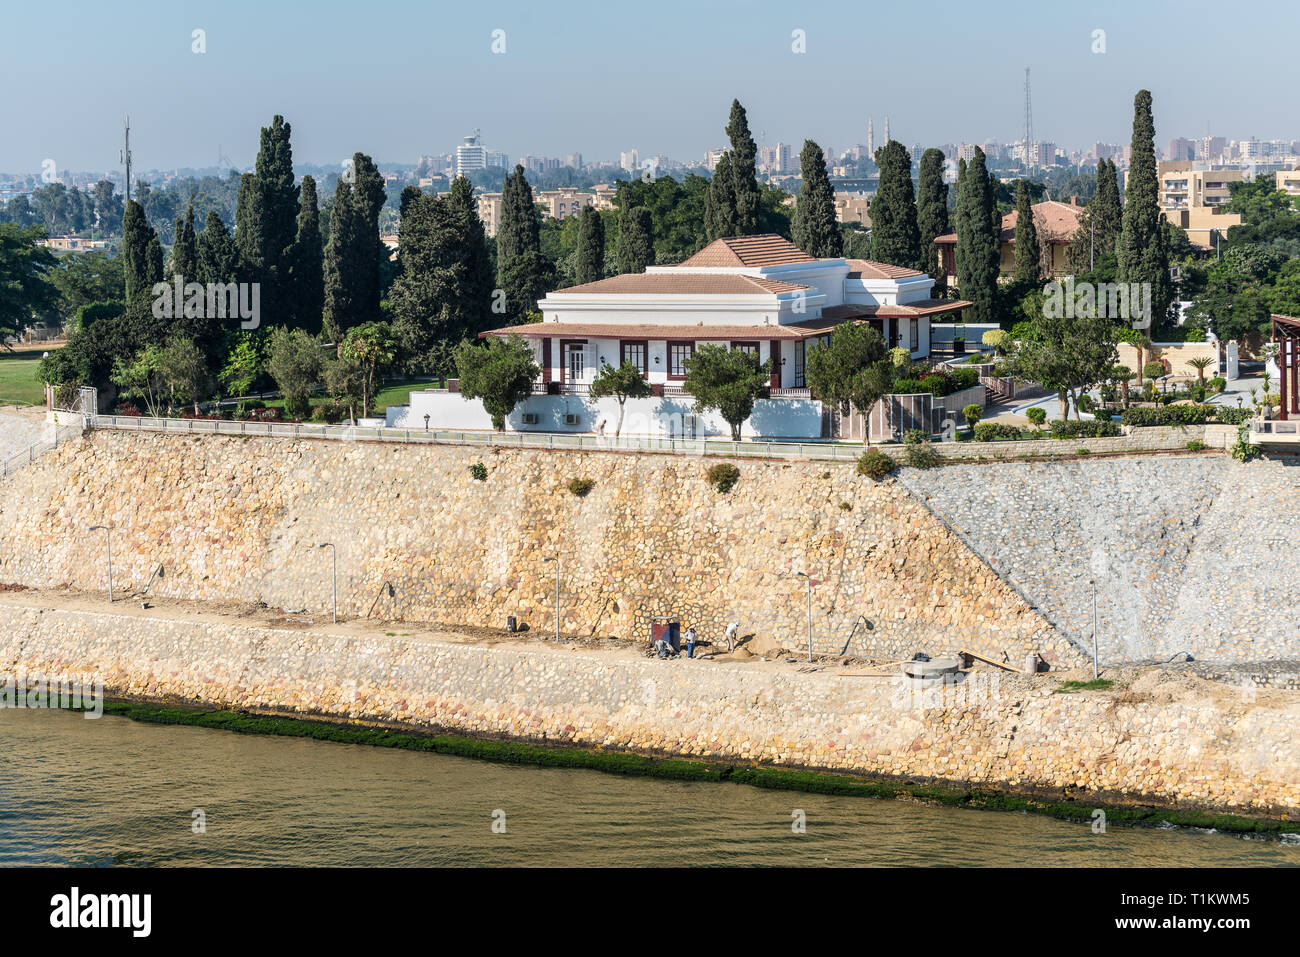 Ismailia Egypt November 5 2017 Mansion On The Shore Of Suez Canal In Ismailia City Egypt Africa Stock Photo Alamy